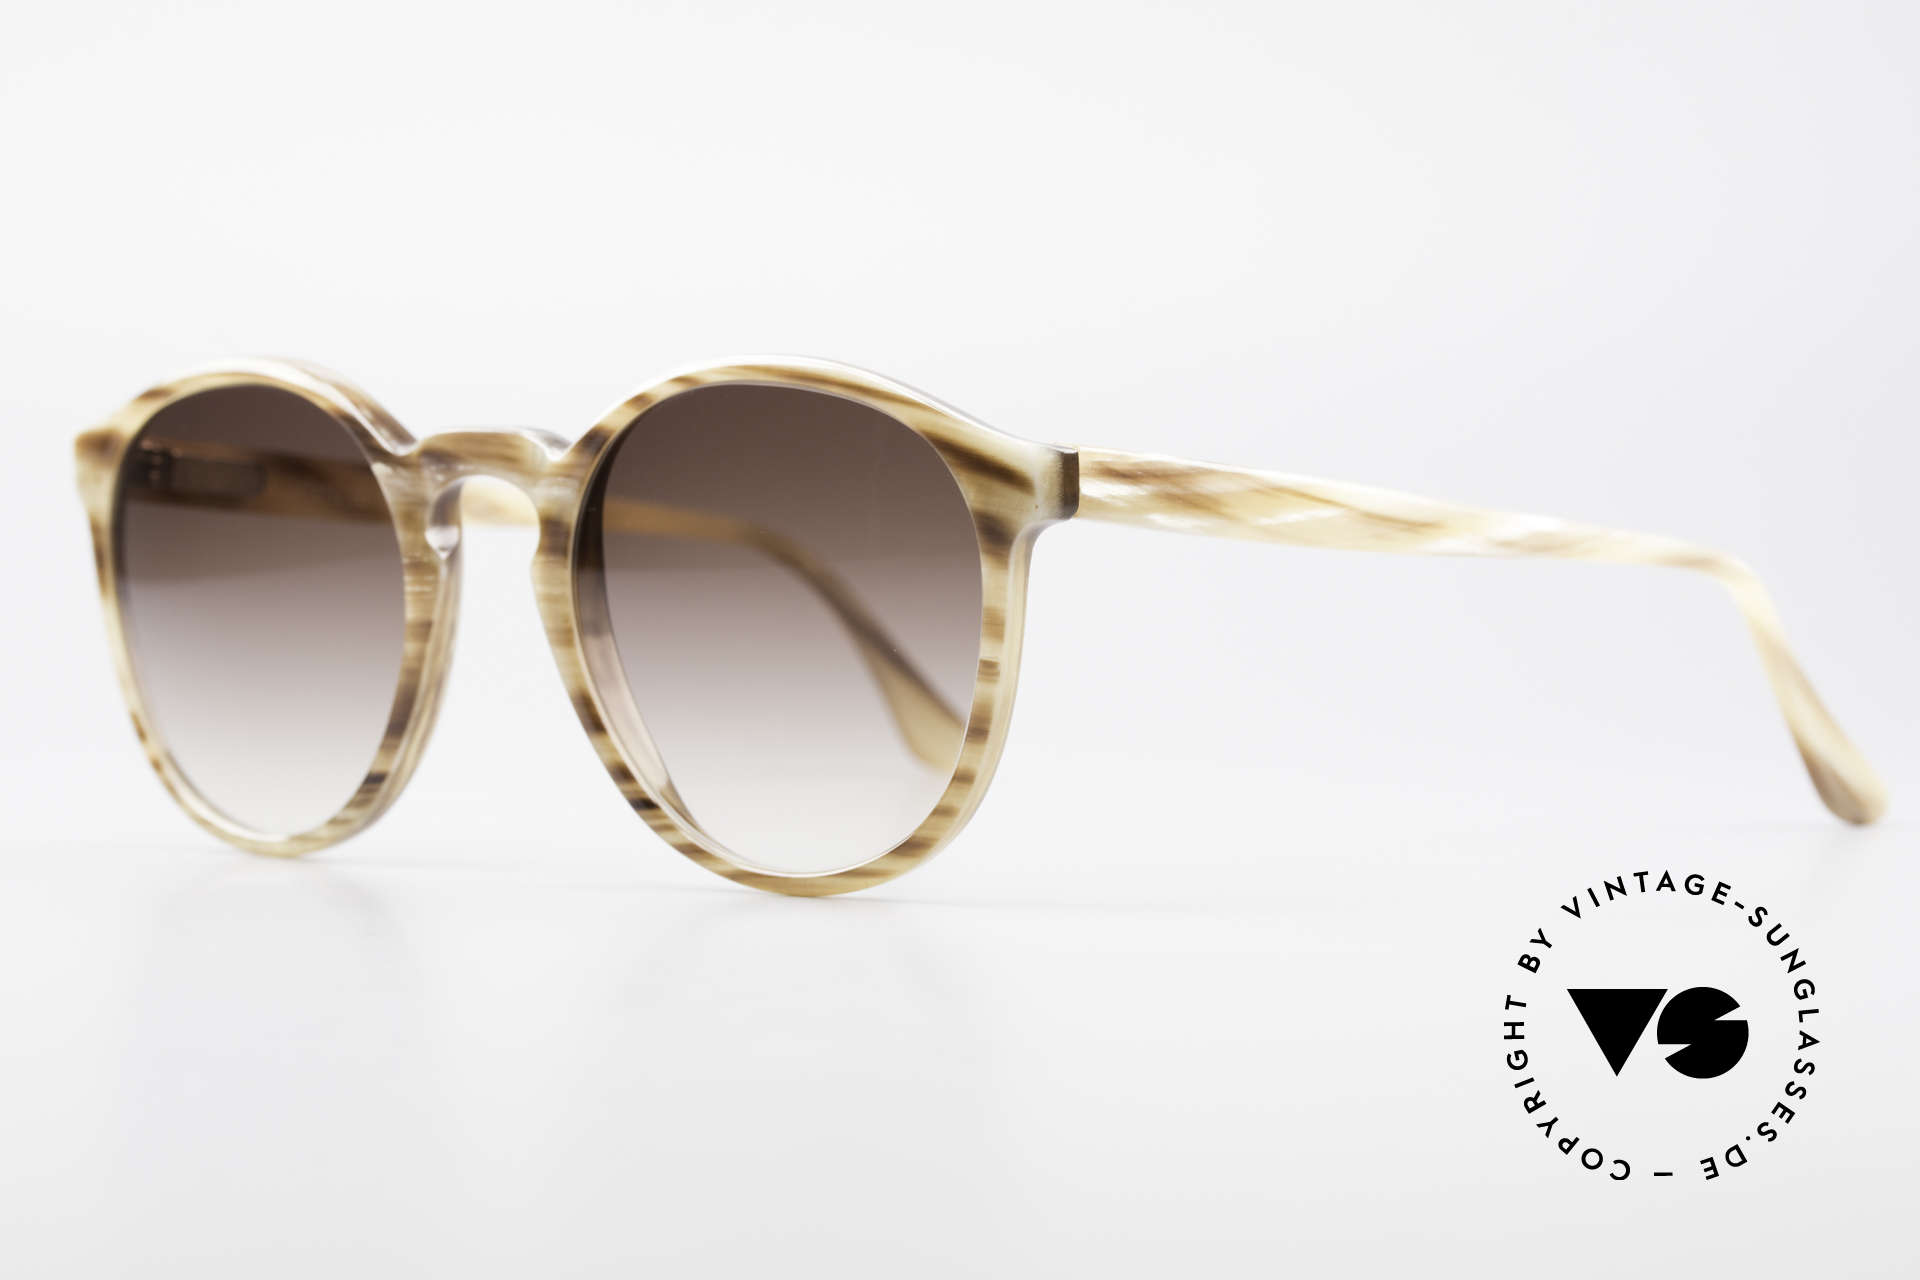 Hartmanns H42 Horn Johnny Depp Style Sunglasses, true rarity (pure natural material, handmade) vertu, Made for Men